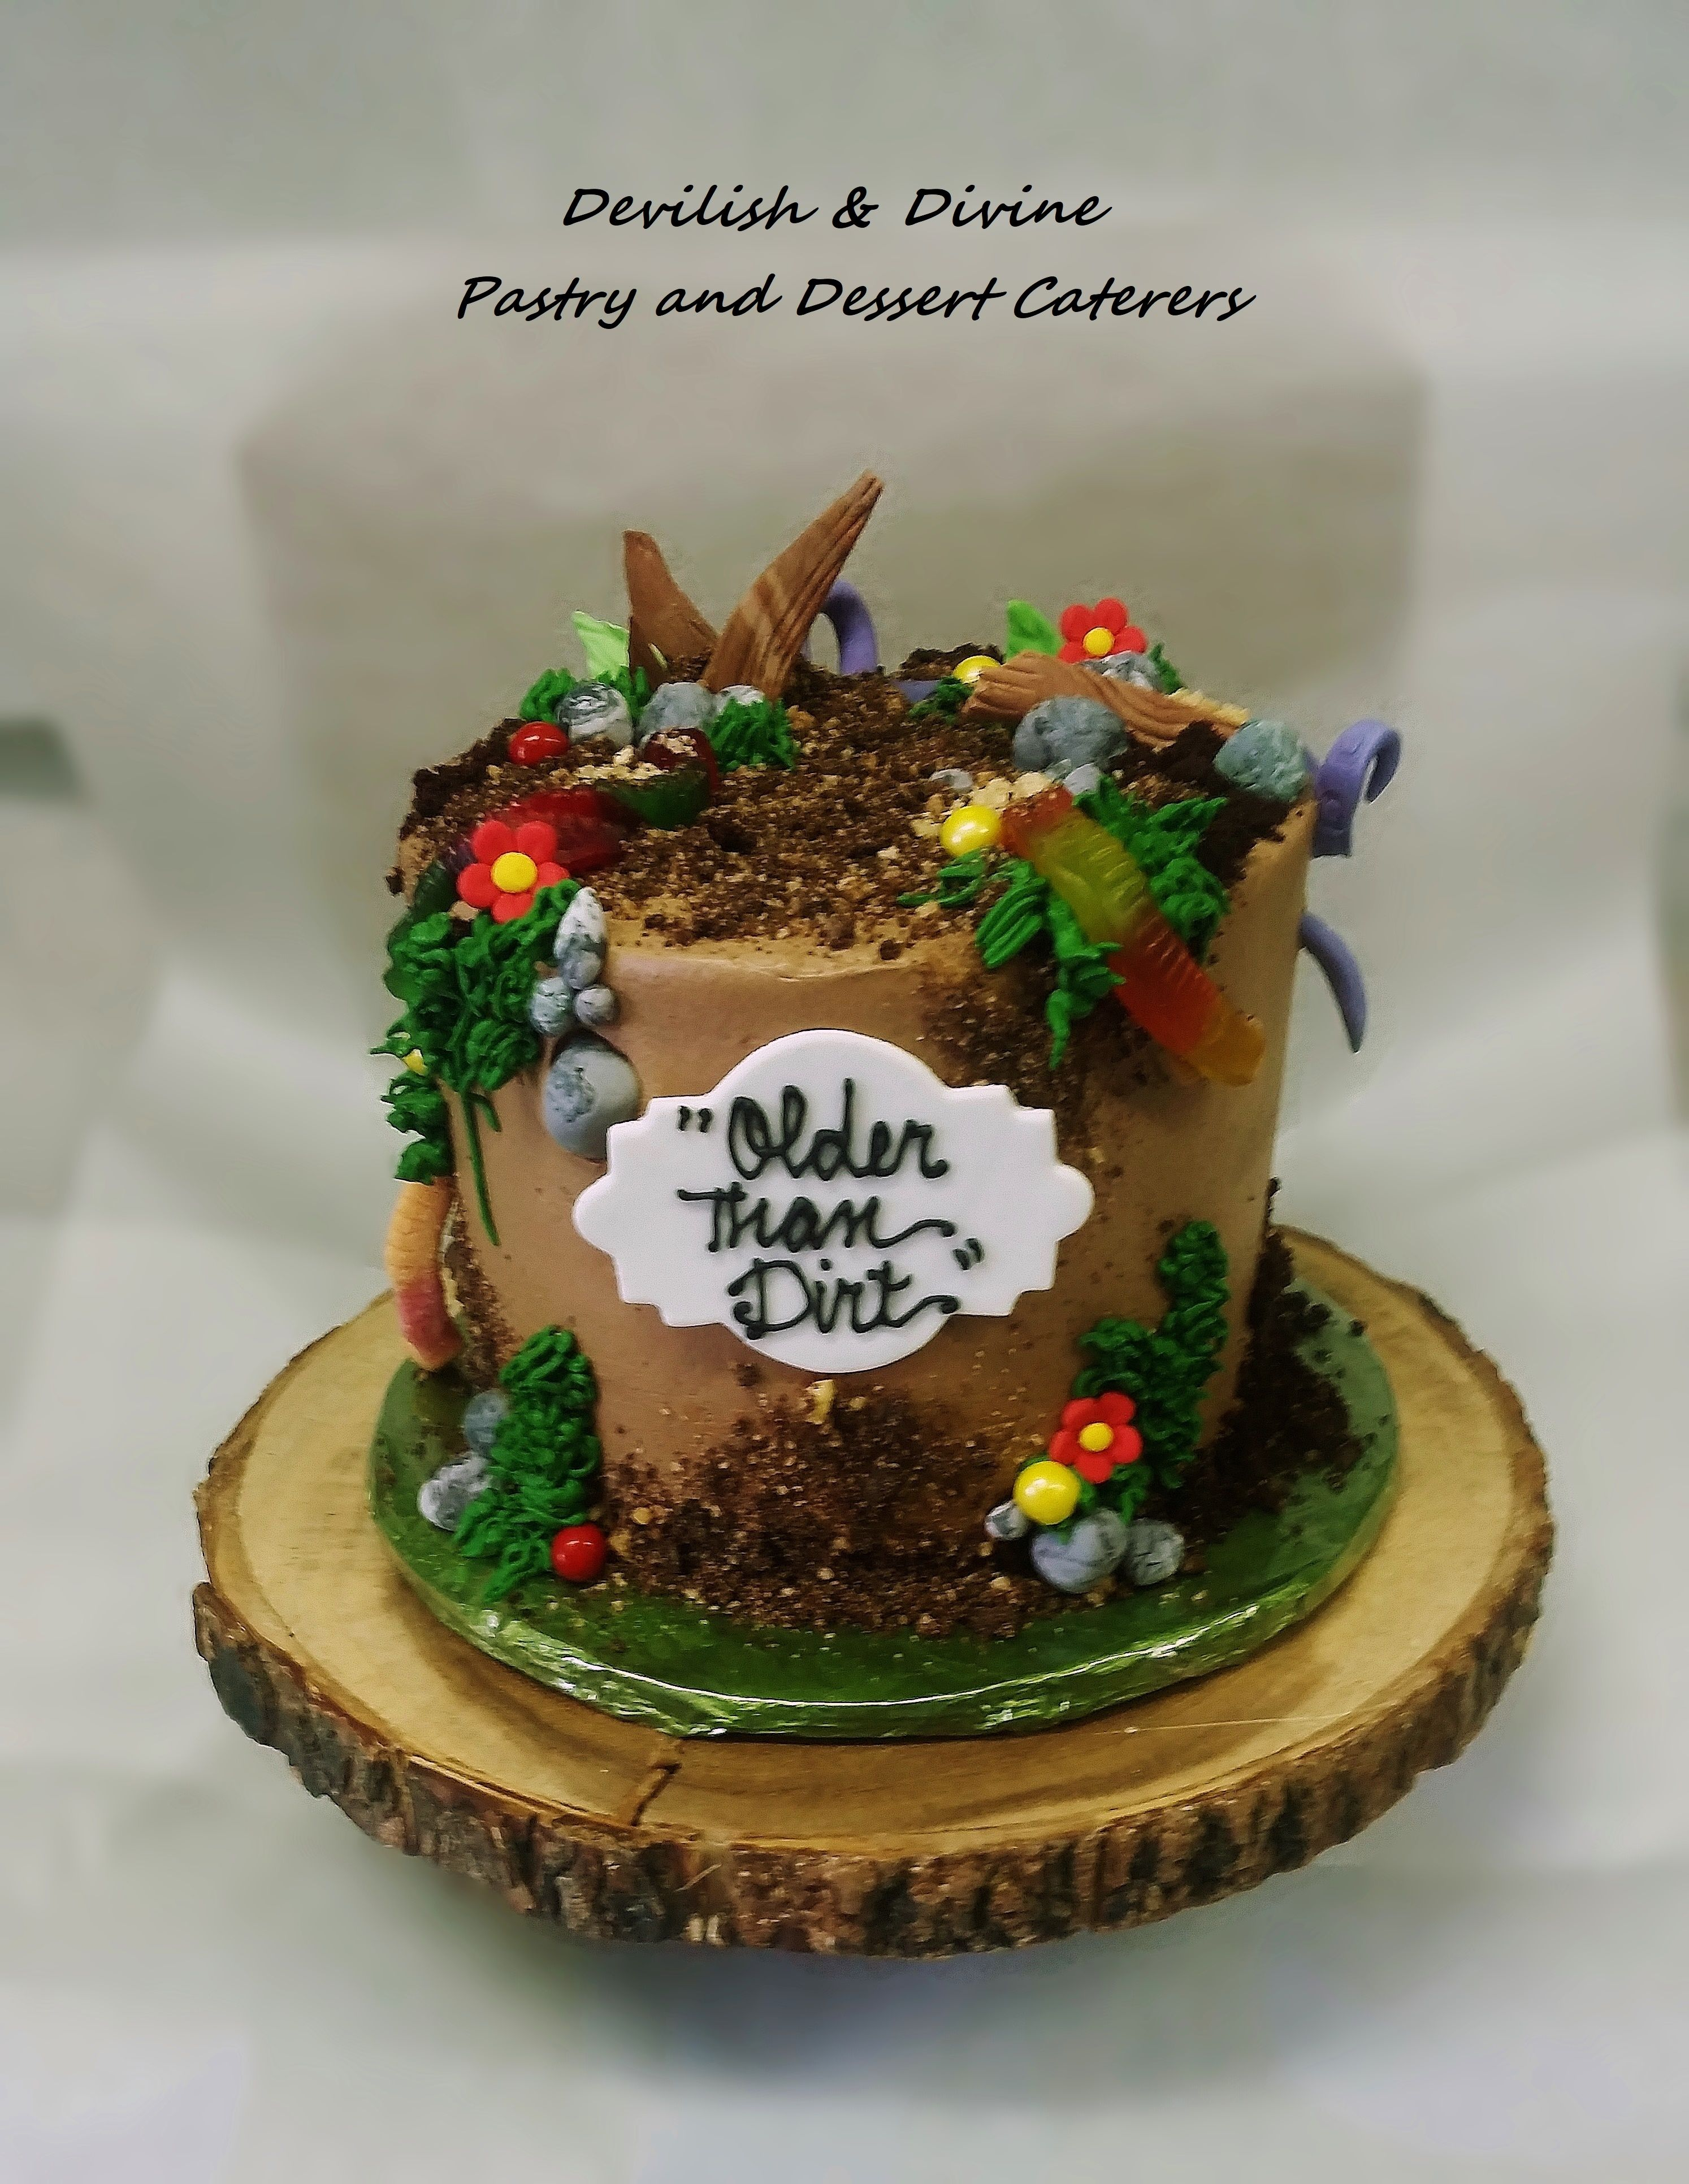 Older Than Dirt Cake Desserts Creative Cakes Cool Cake Designs